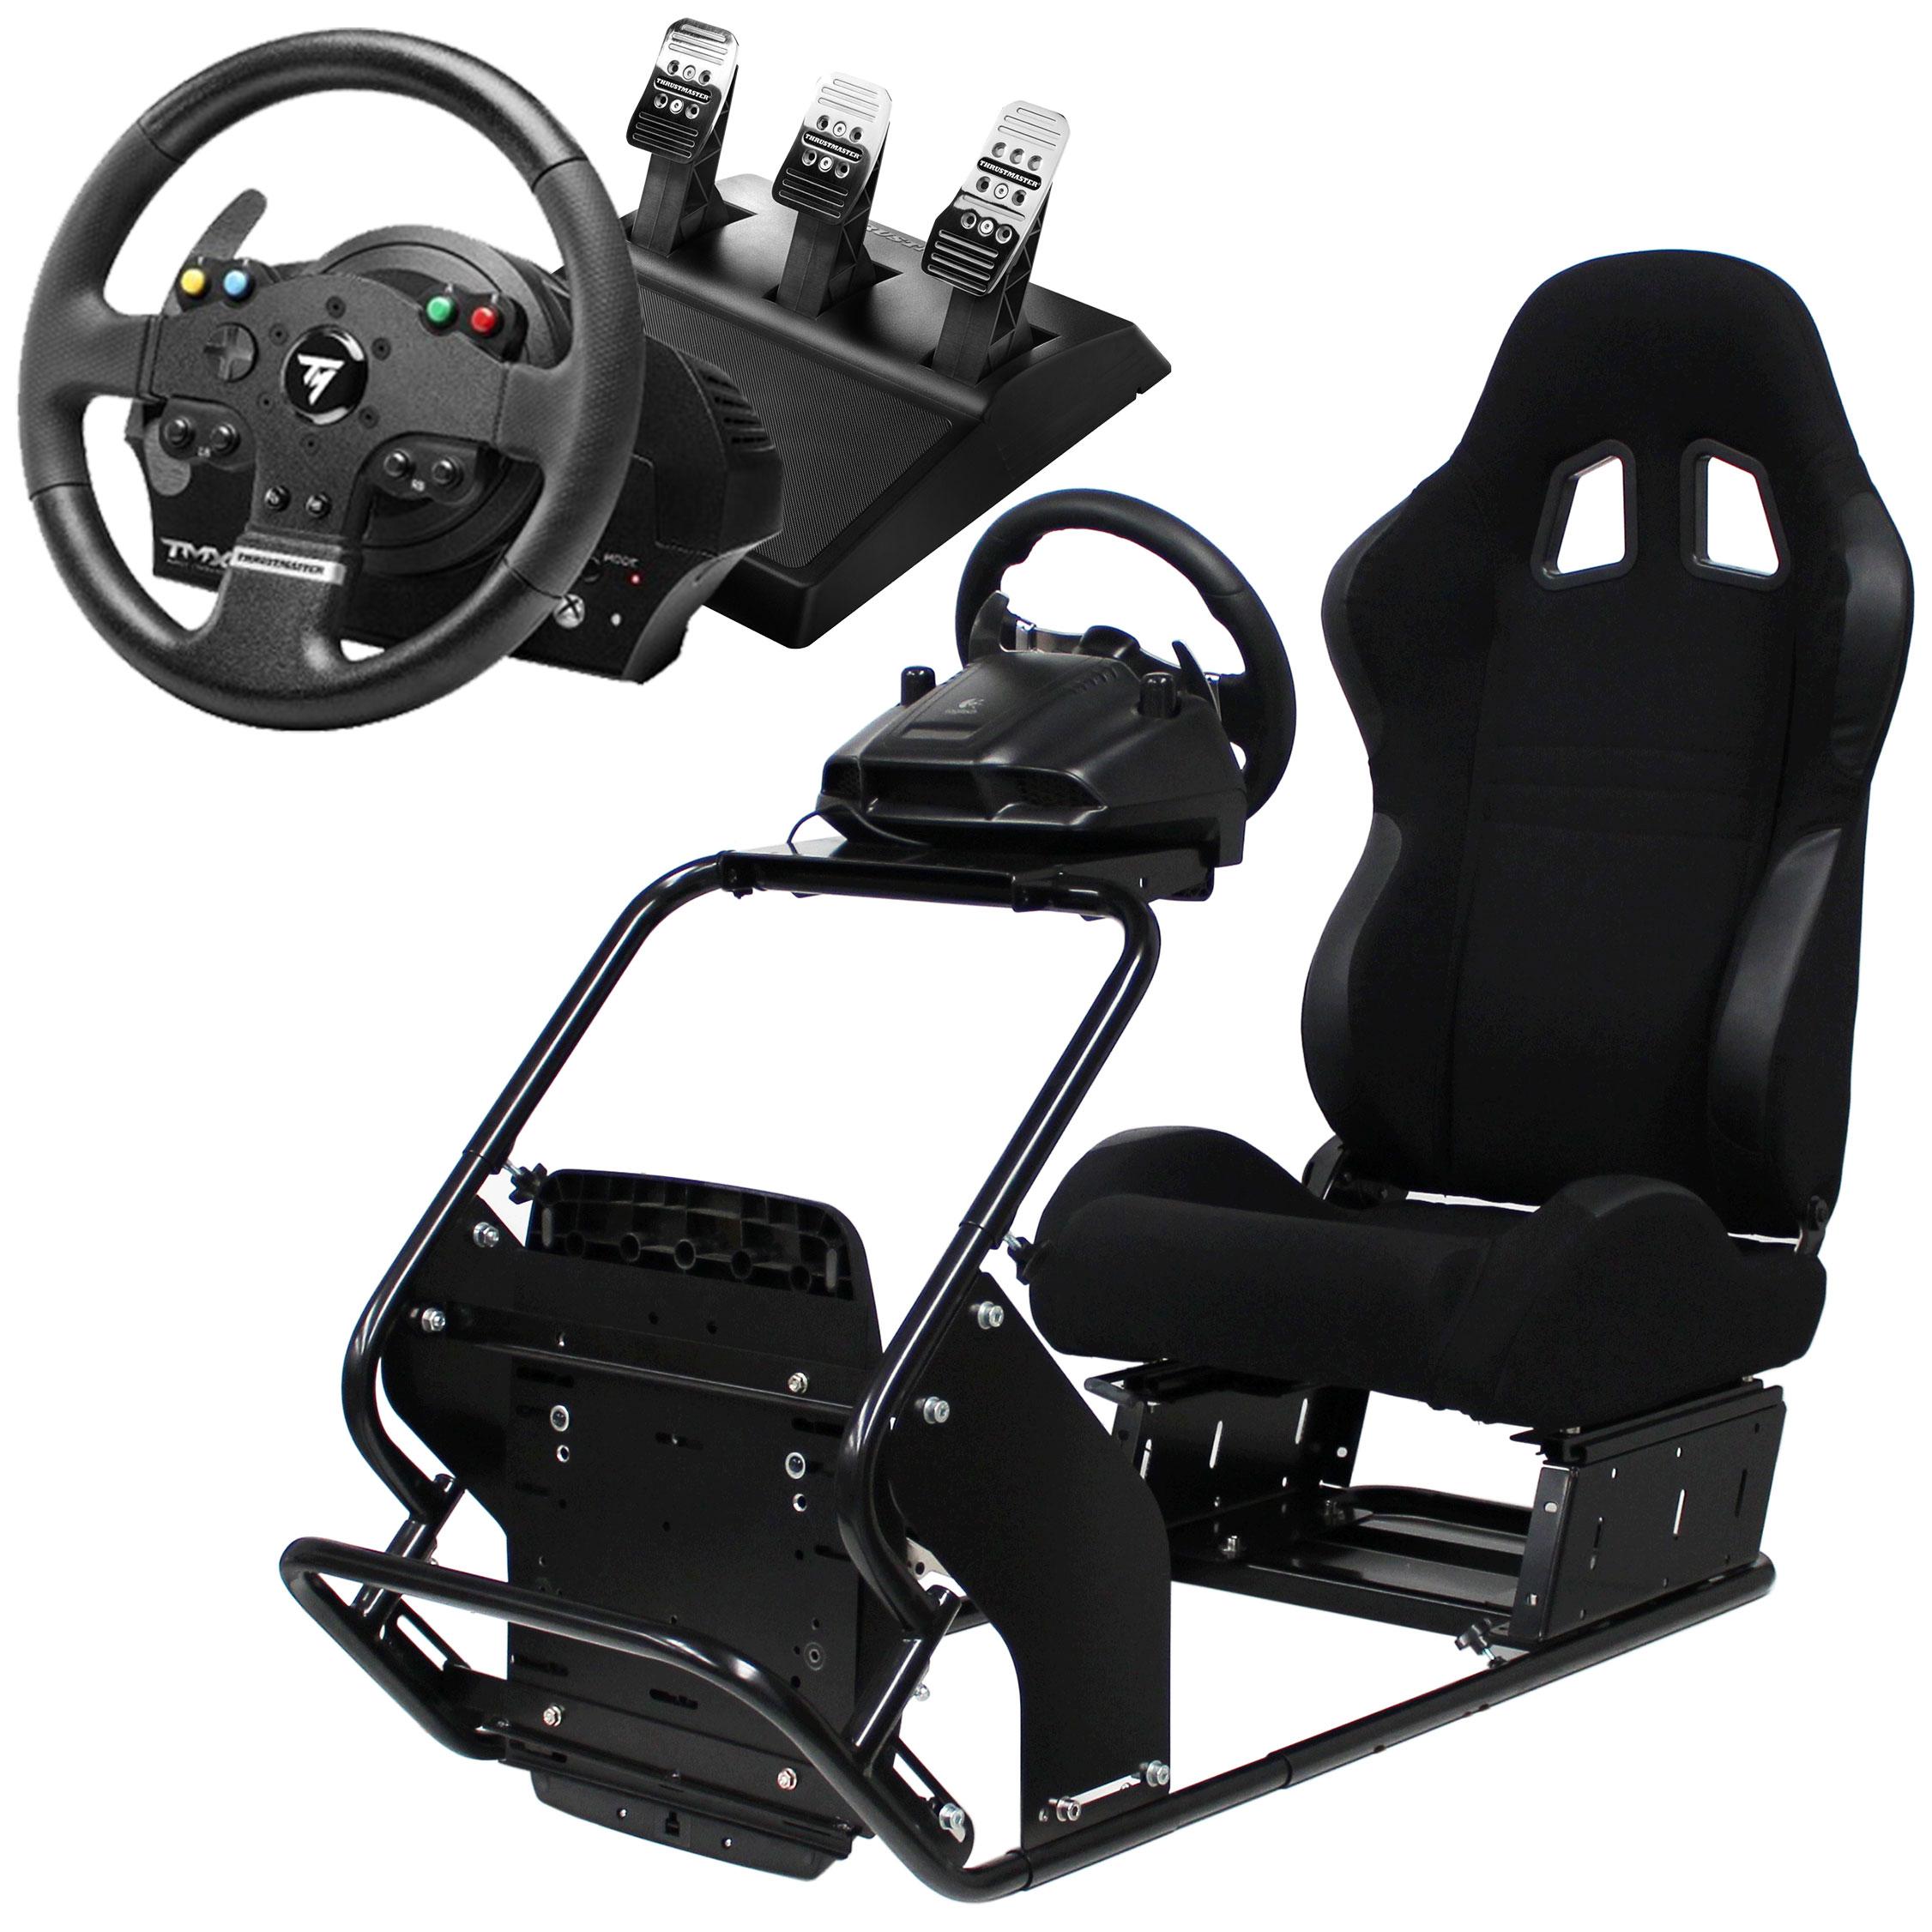 RACE SIM D-RS 0001-S1 & TMX PRO WHEEL